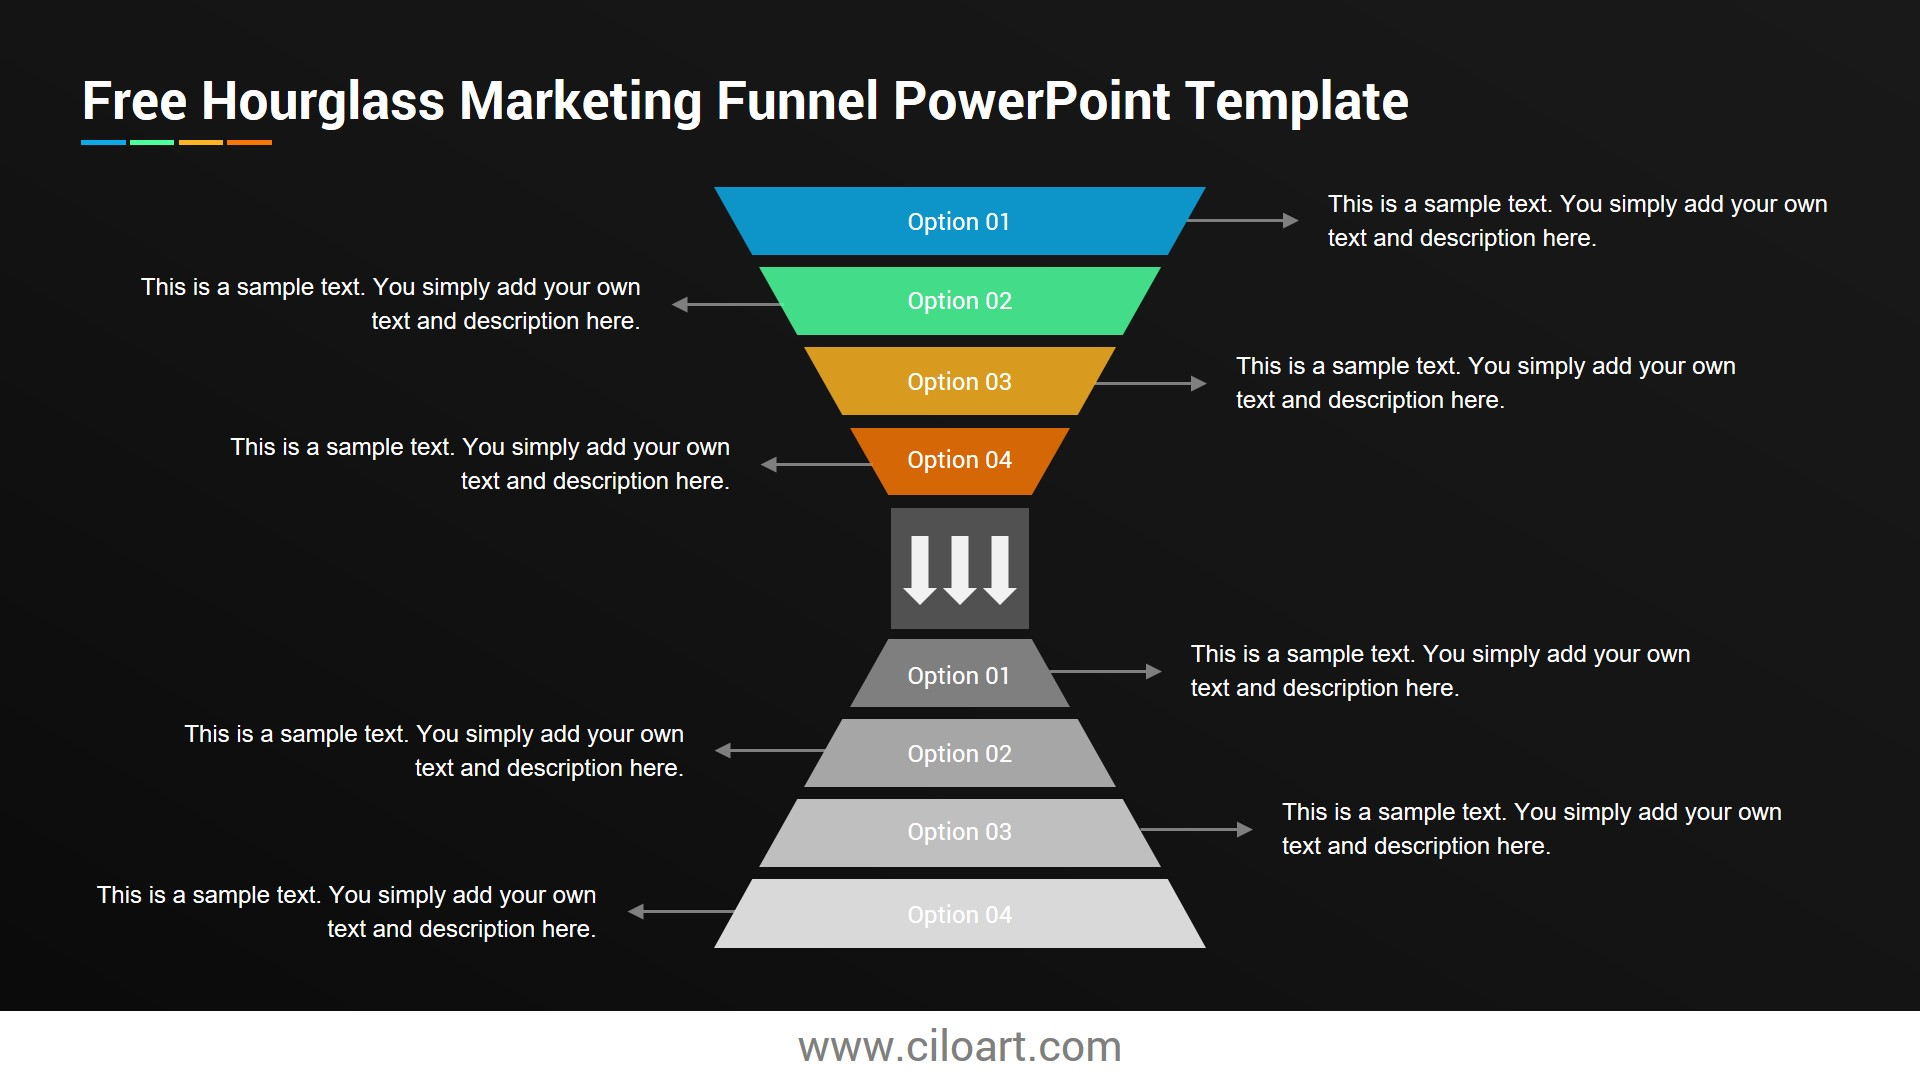 Hourglass Marketing Funnel Free Powerpoint Template Ciloart